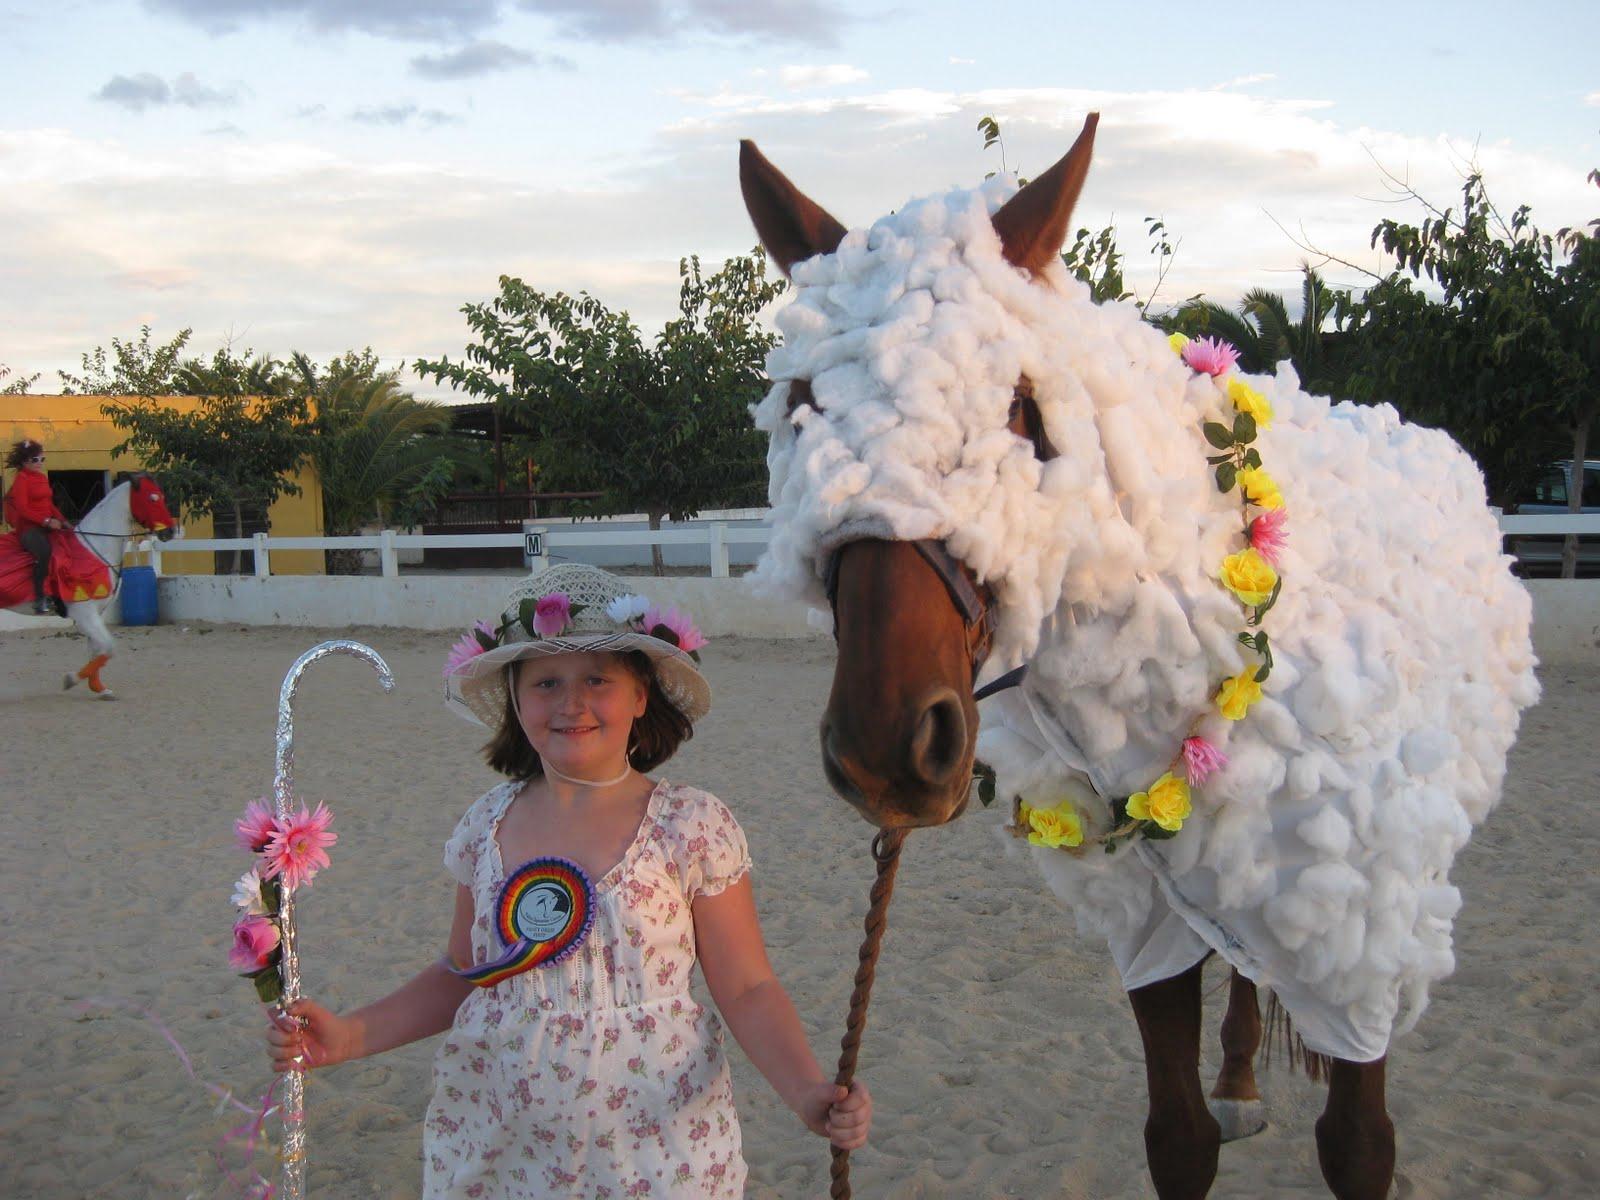 Chestnut Brown Horse Tabard Fancy Dress Costume For Kids |Horse Fancy Dress Costumes